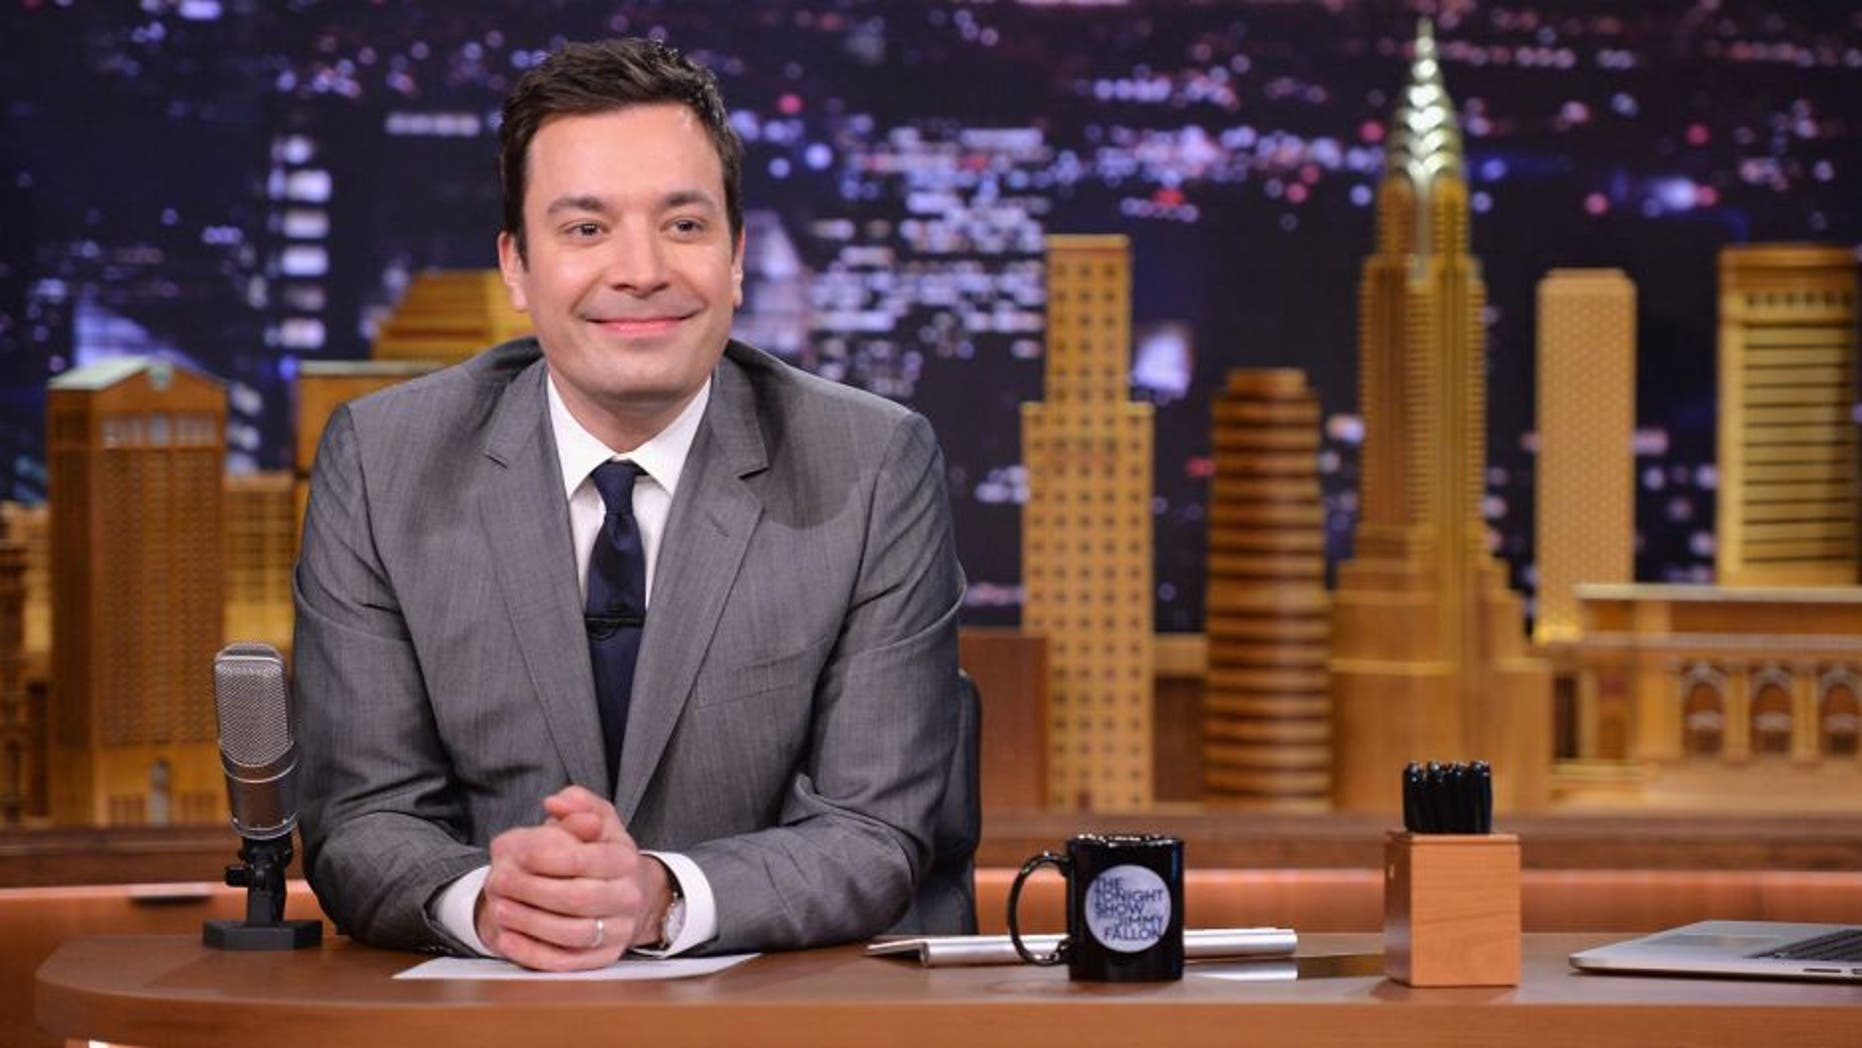 "NEW YORK, NY - FEBRUARY 26: Jimmy Fallon hosts ""The Tonight Show Starring Jimmy Fallon"" at Rockefeller Center on February 26, 2014 in New York City. (Photo by Mike Coppola/Getty Images for The Tonight Show Starring Jimmy Fallon)"